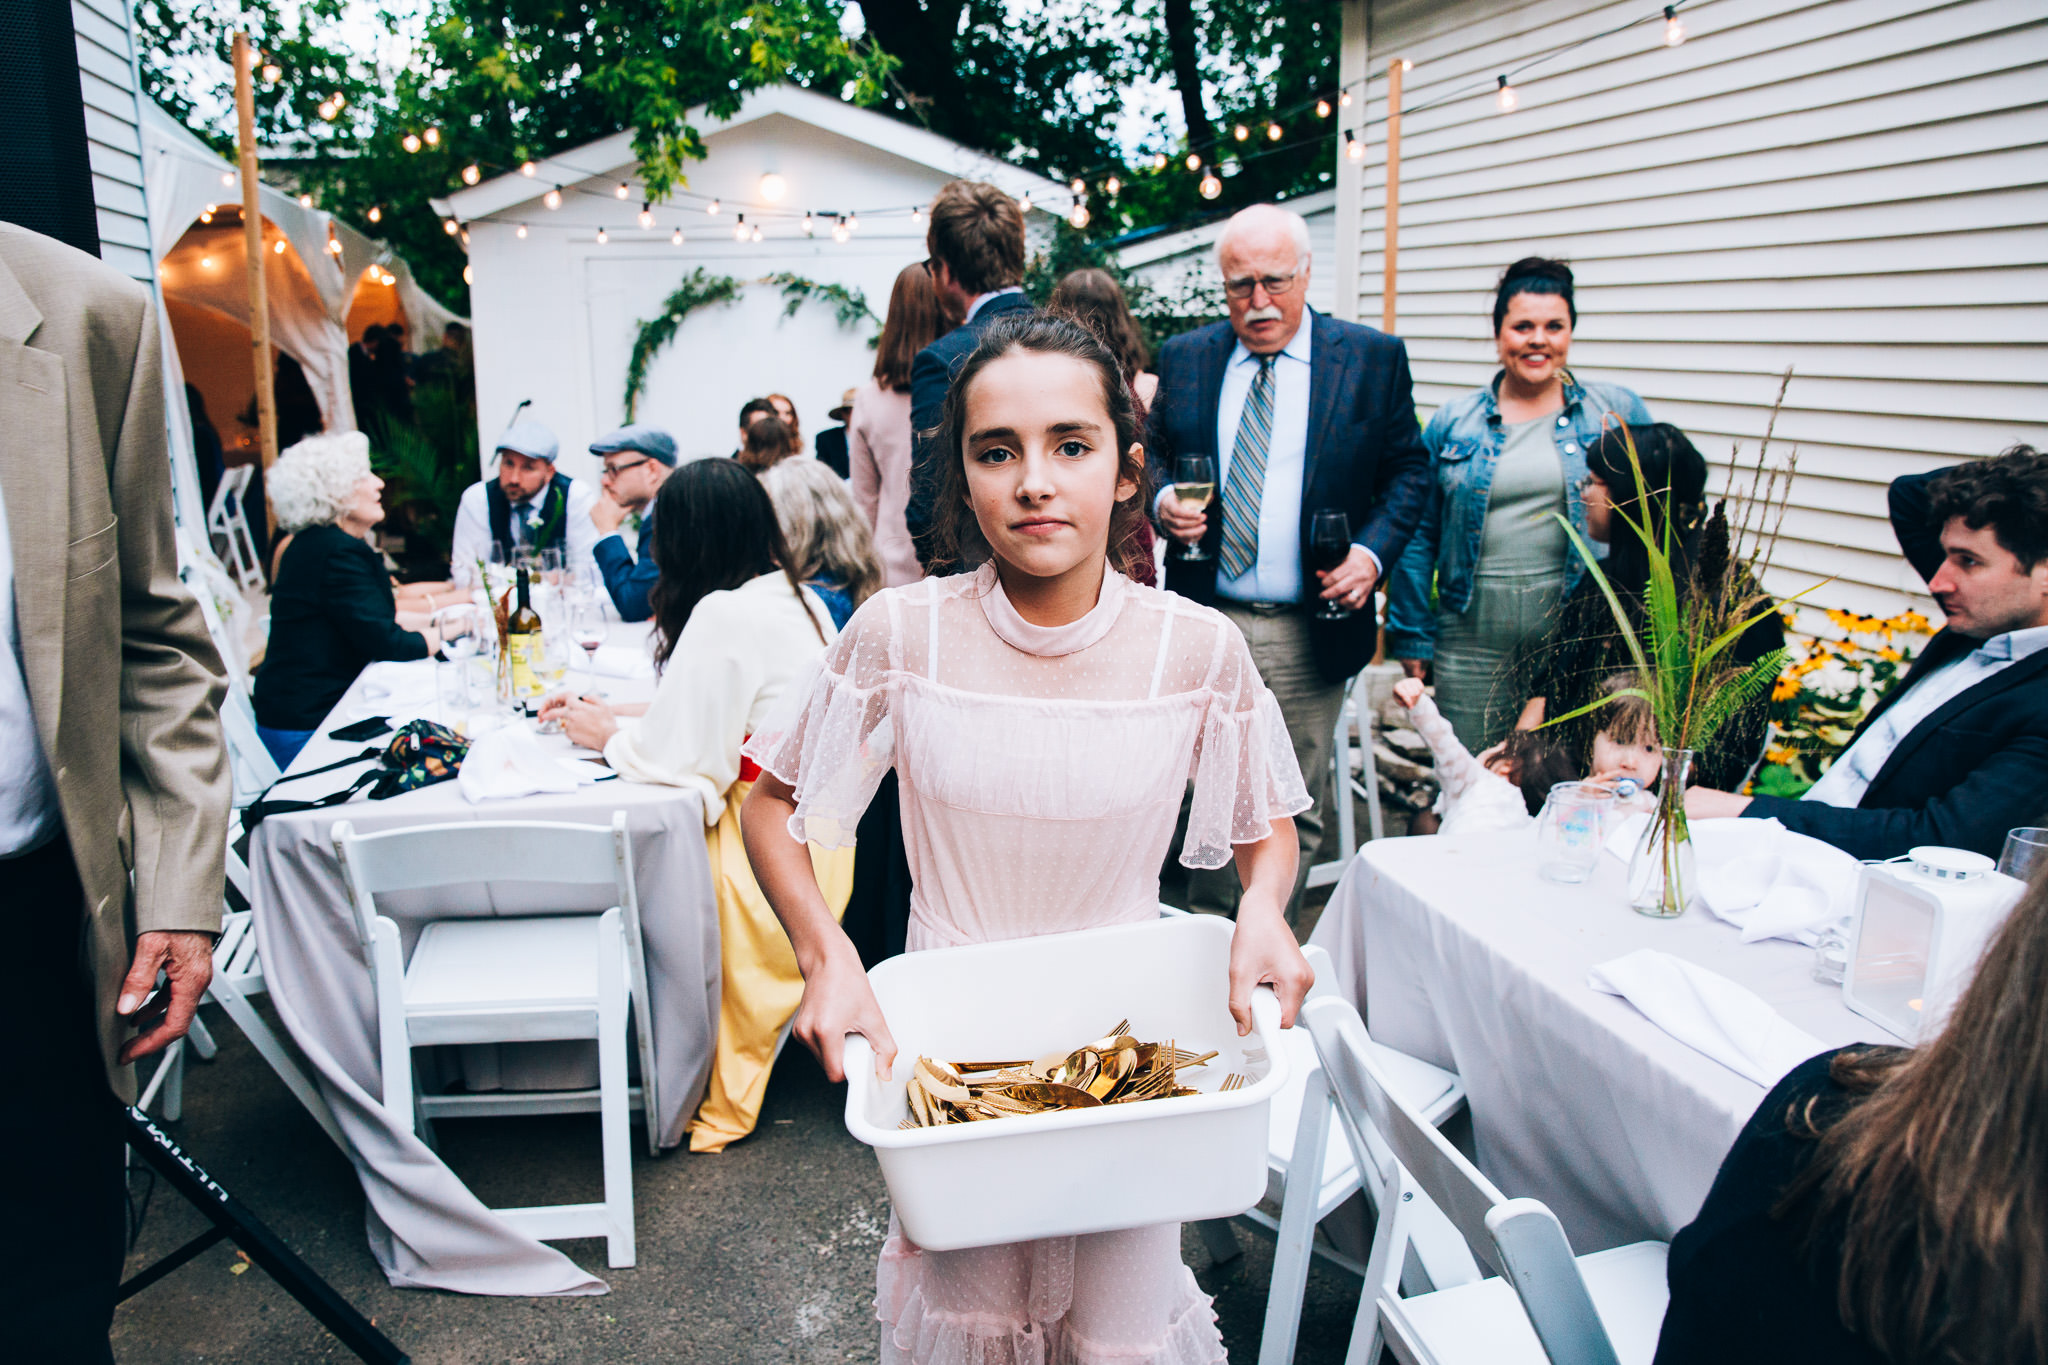 074_Canada-documentary-wedding-photograp